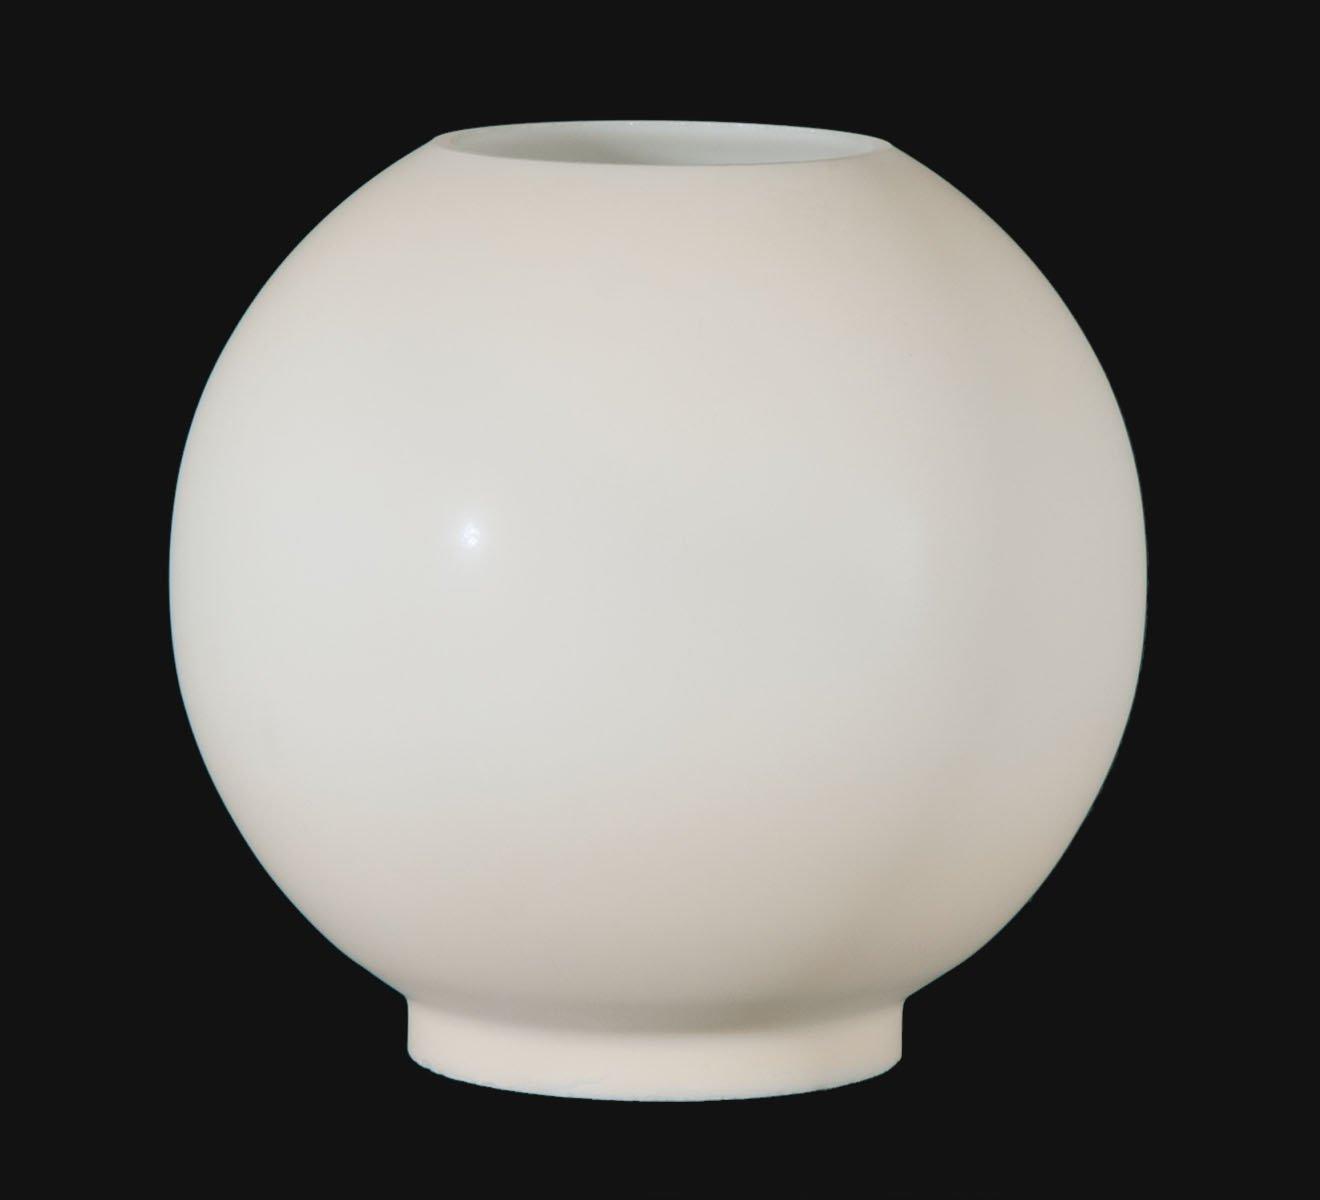 B&P Lamp Opal Glass Ball Shade, Cream Tint